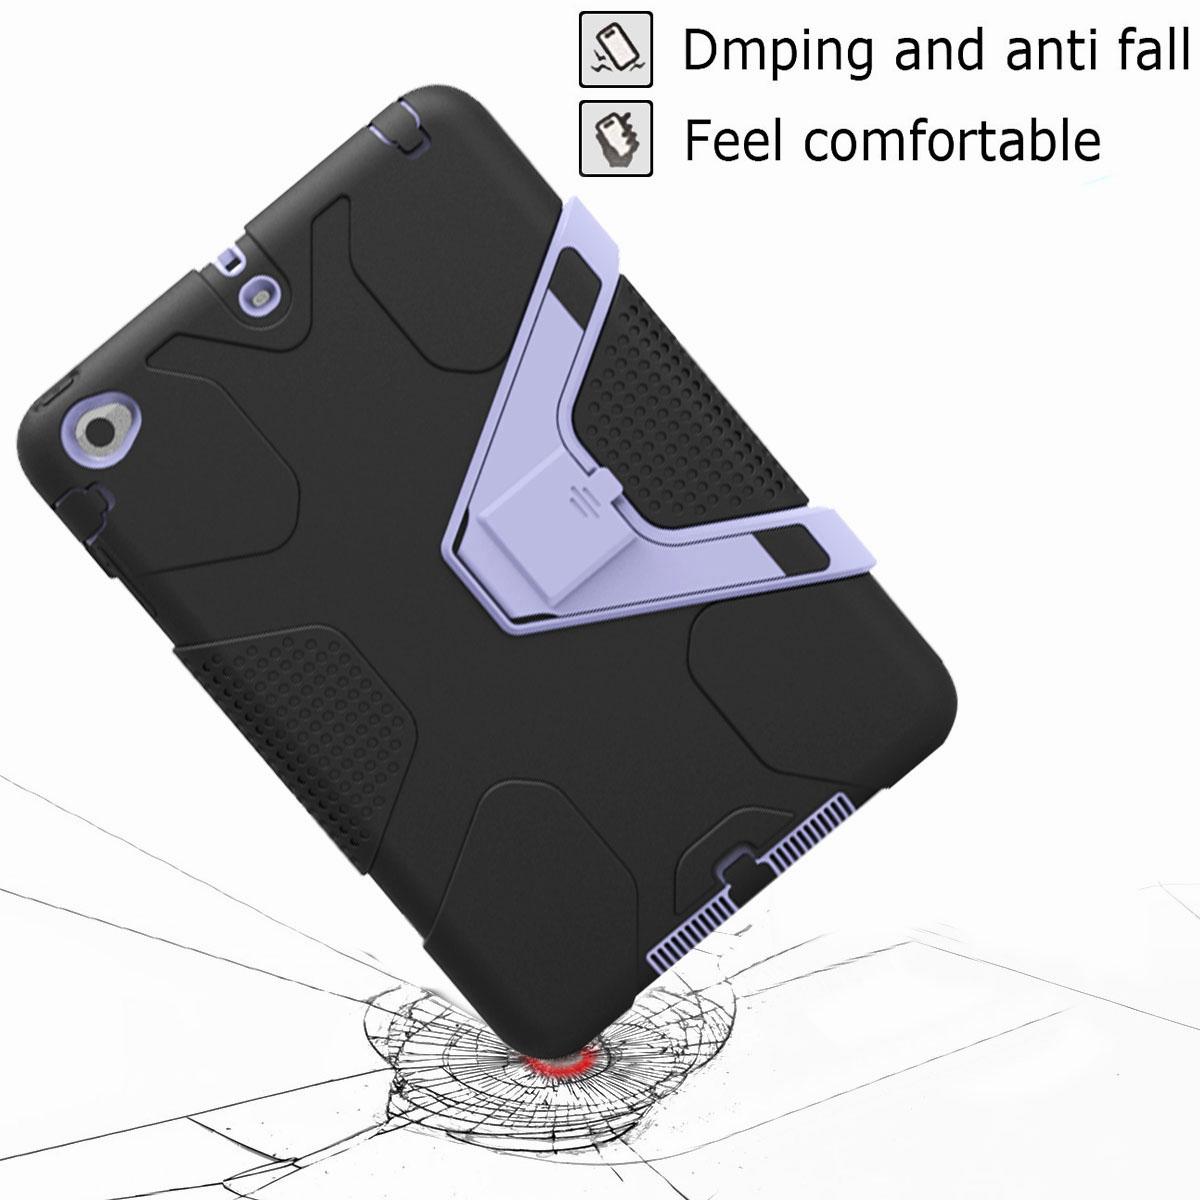 Luxury-Shockproof-Tough-Armor-with-Hard-Kickstand-Case-For-Apple-iPad-Mini-1-2-3 thumbnail 51